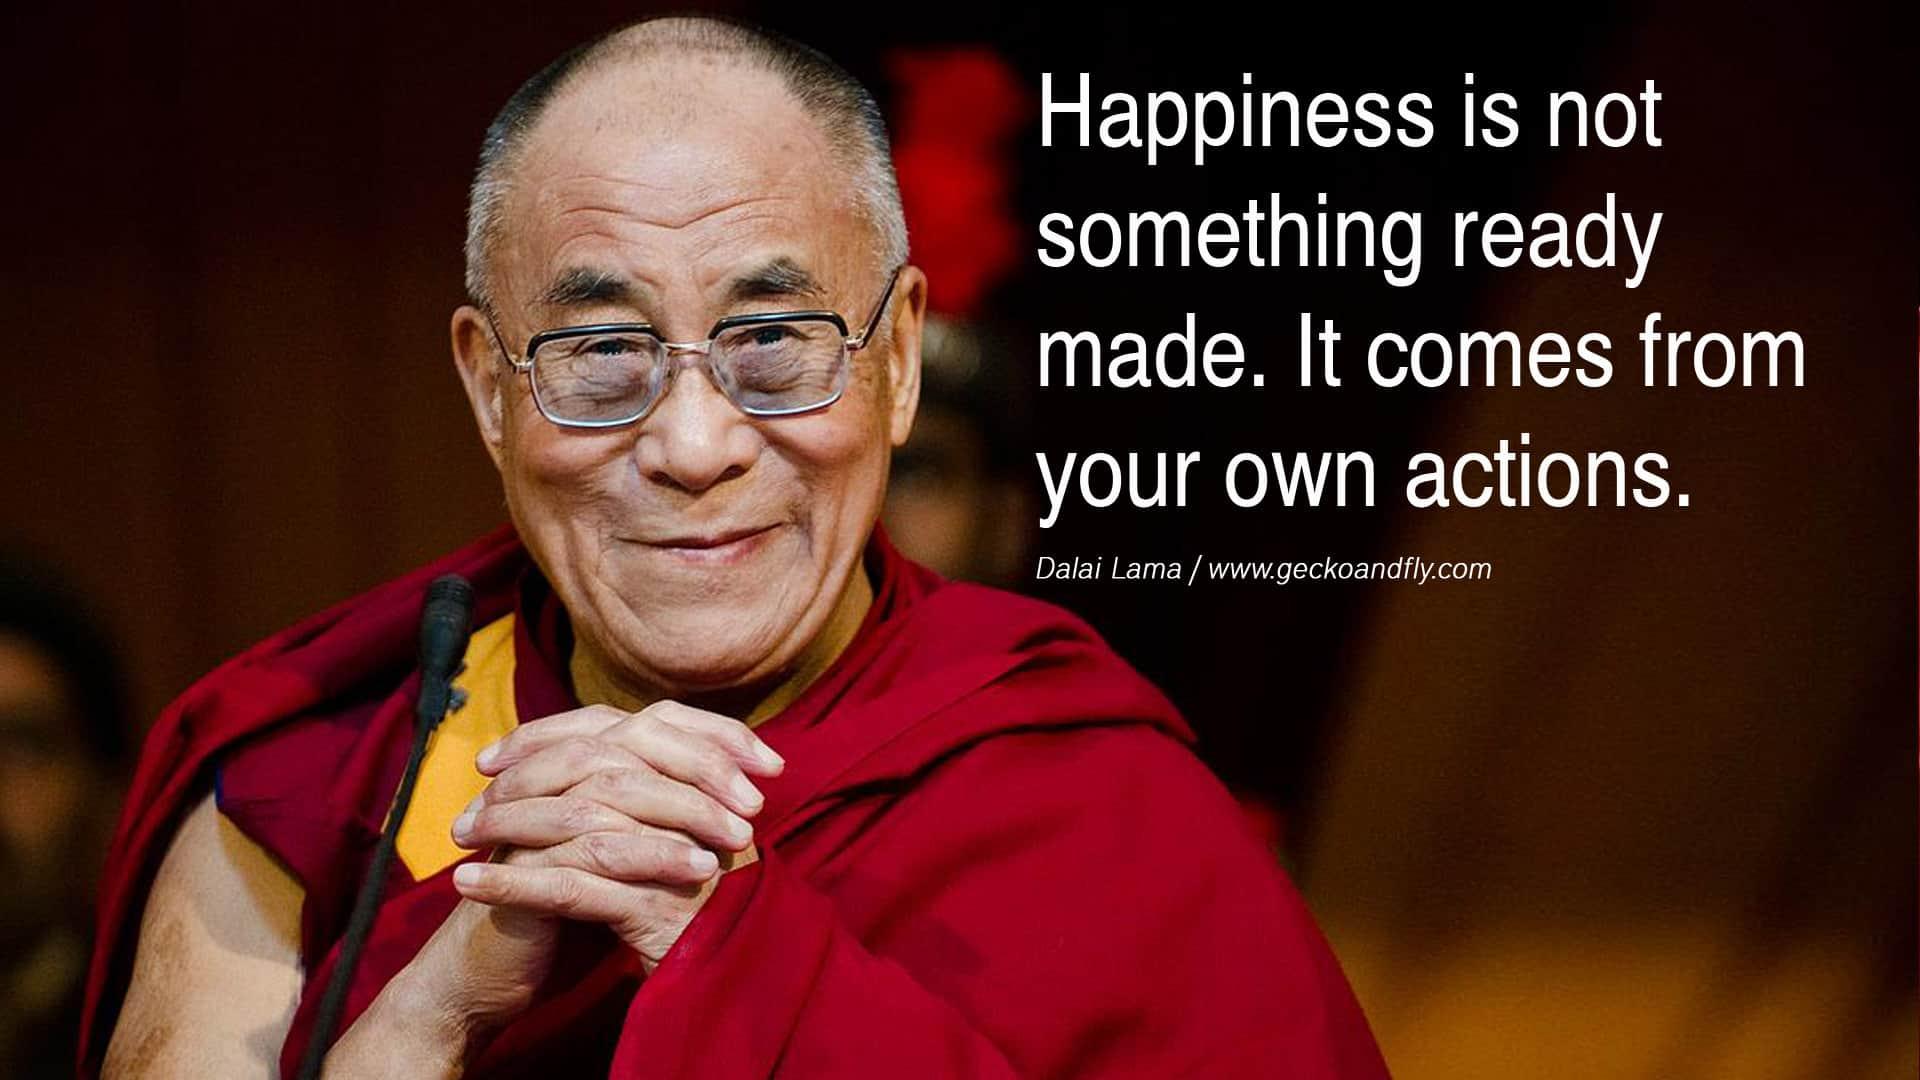 dalai lama quotes 15